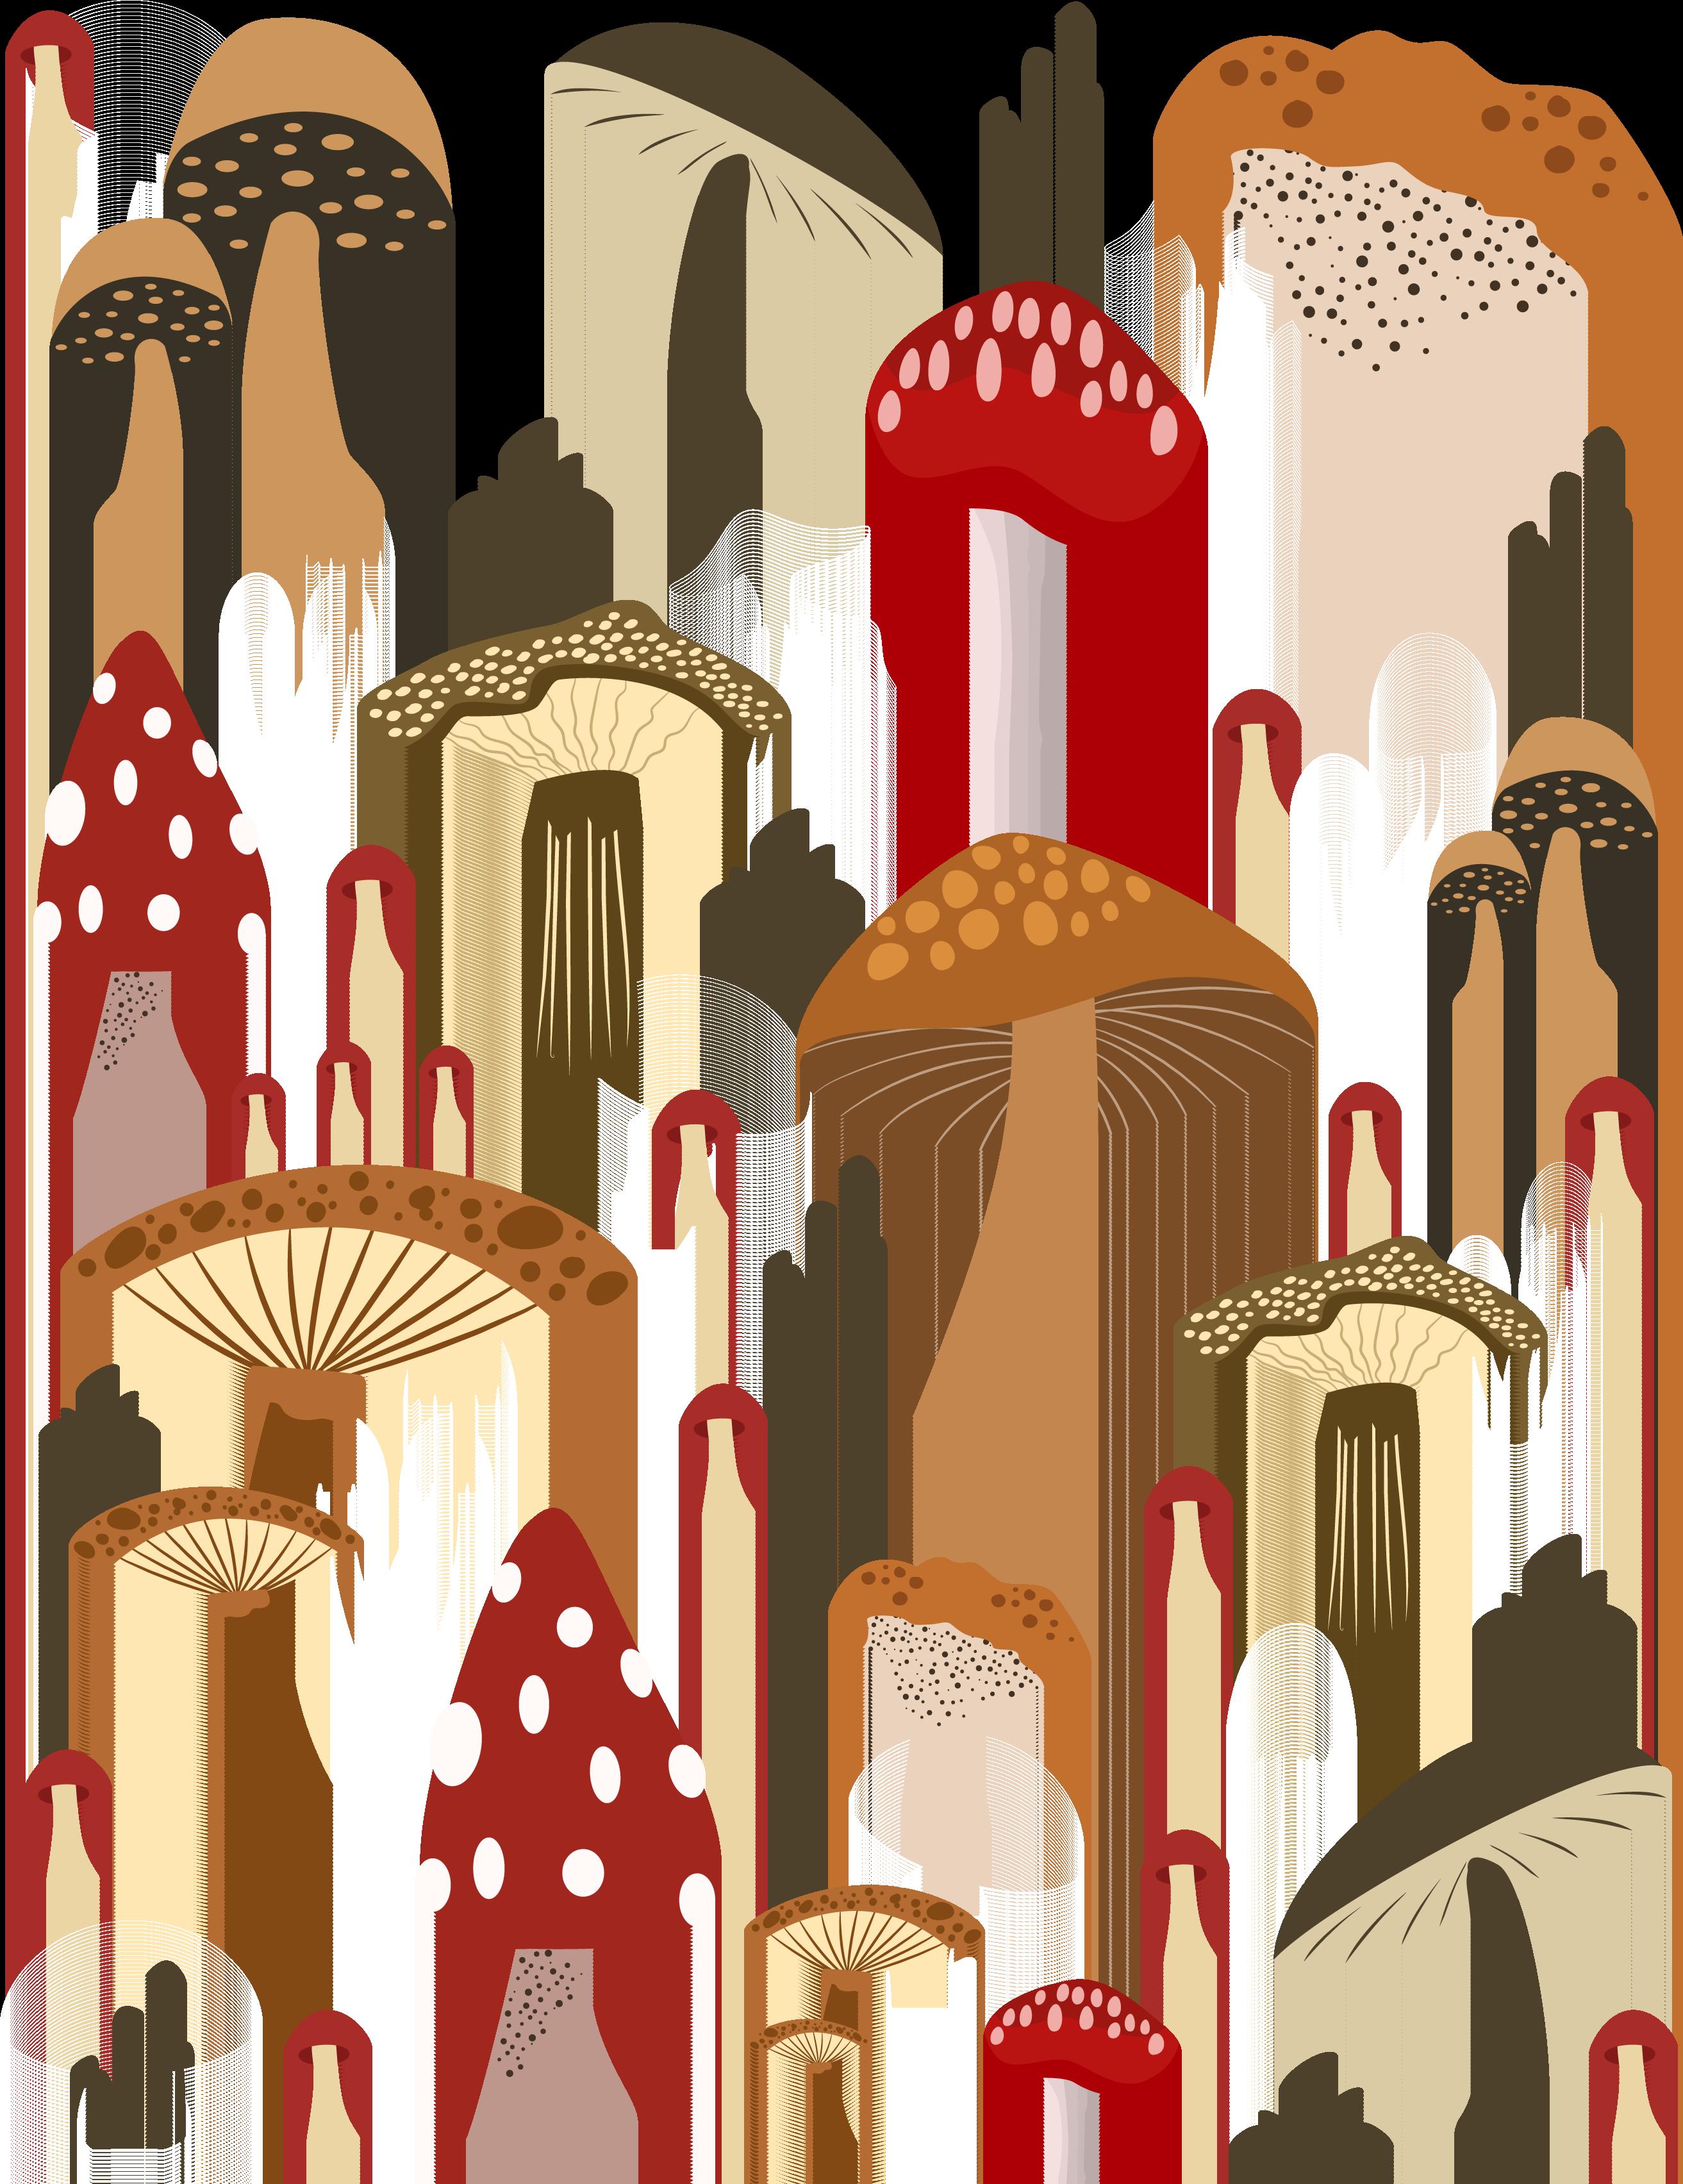 Mushrooms clipart button mushroom. Computer icons illustration featured